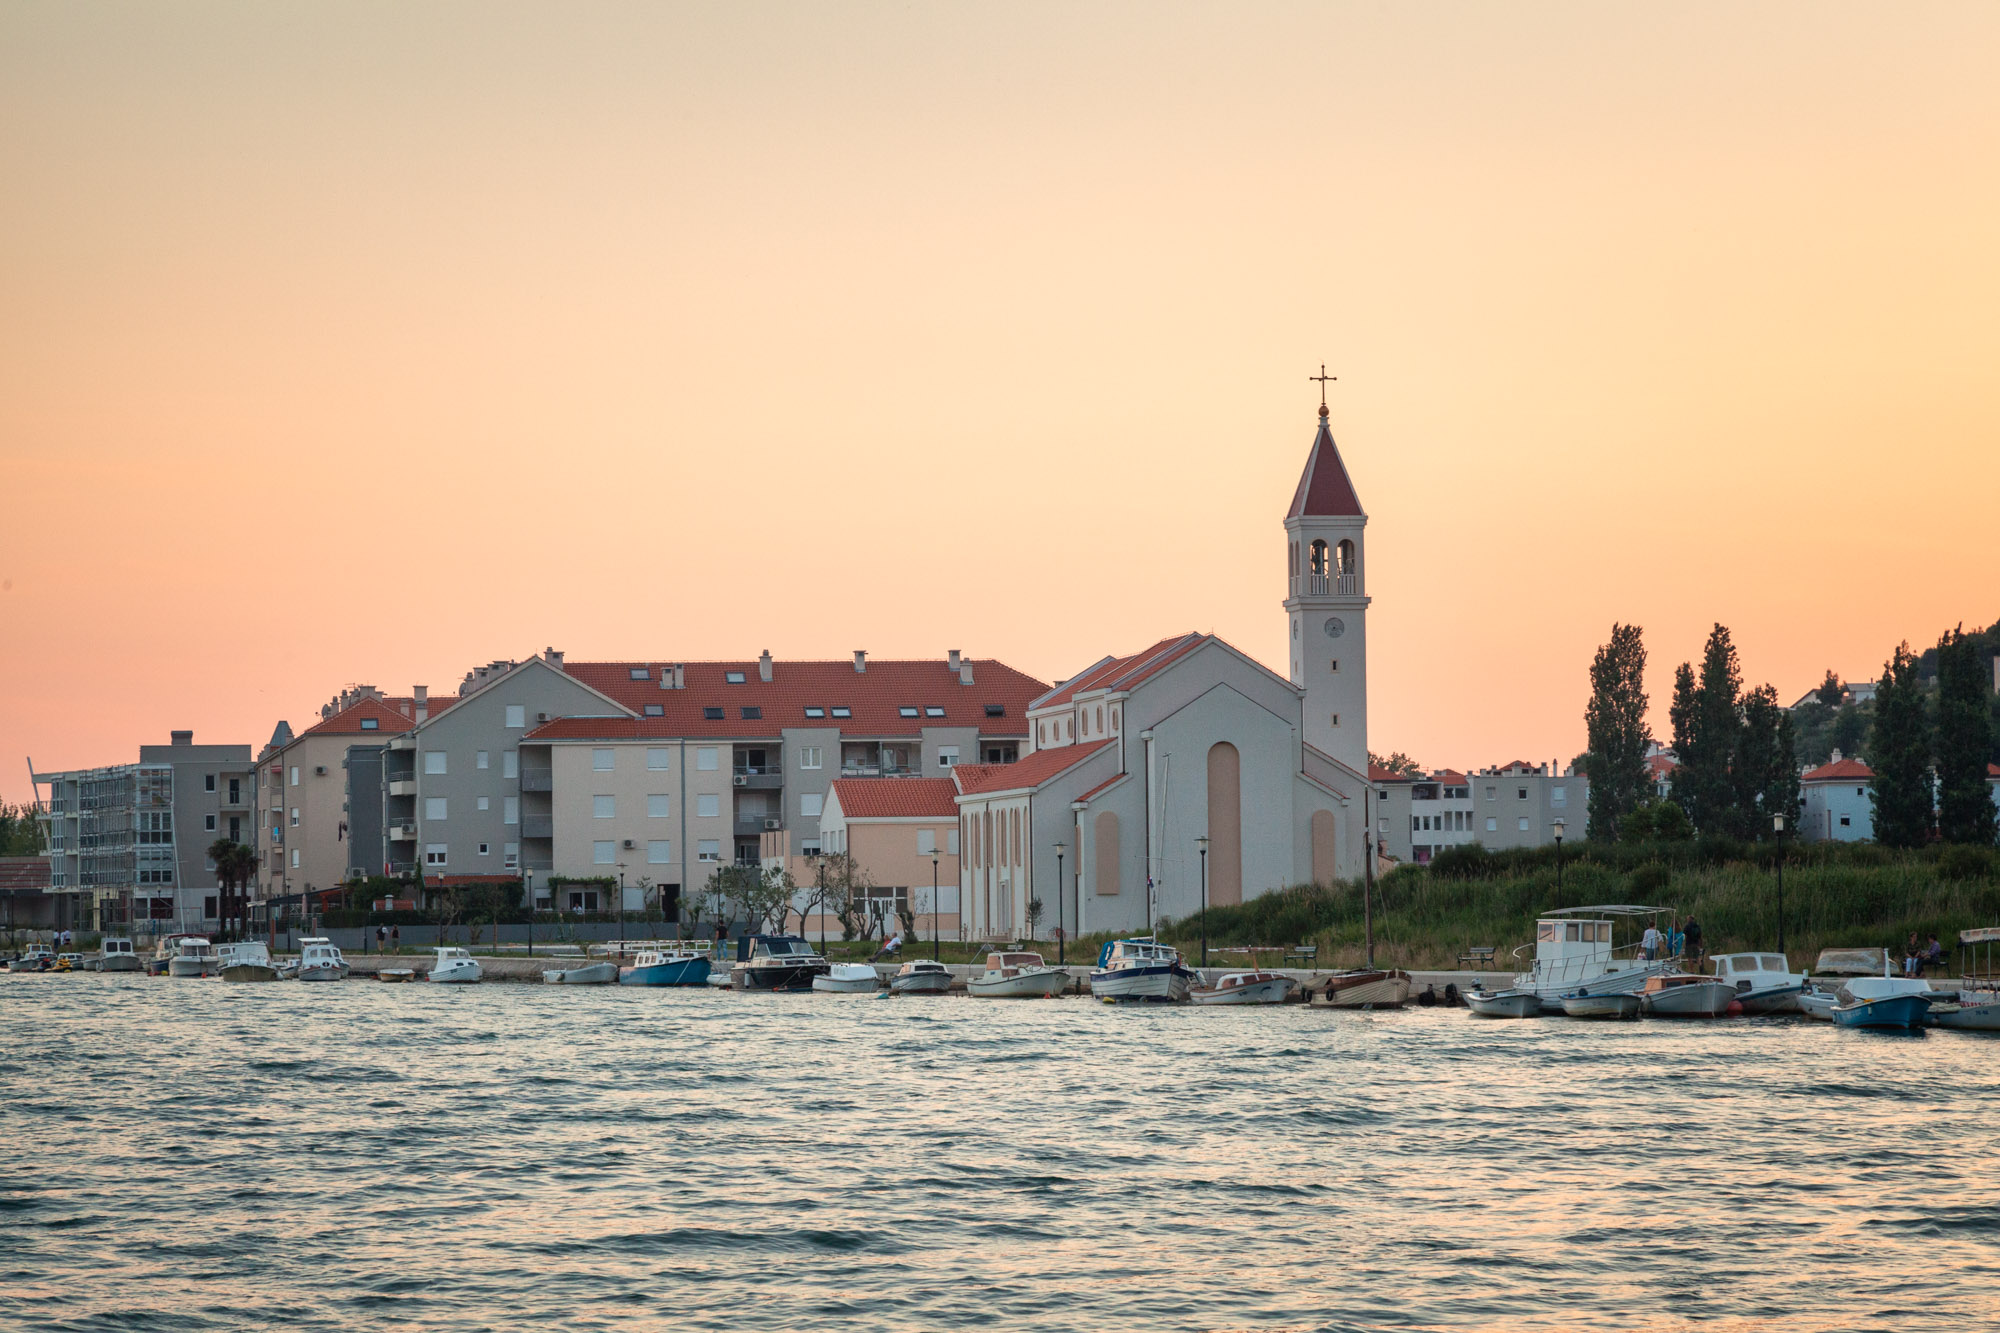 Church of Saint Peter on Priko, Omis, Croatia